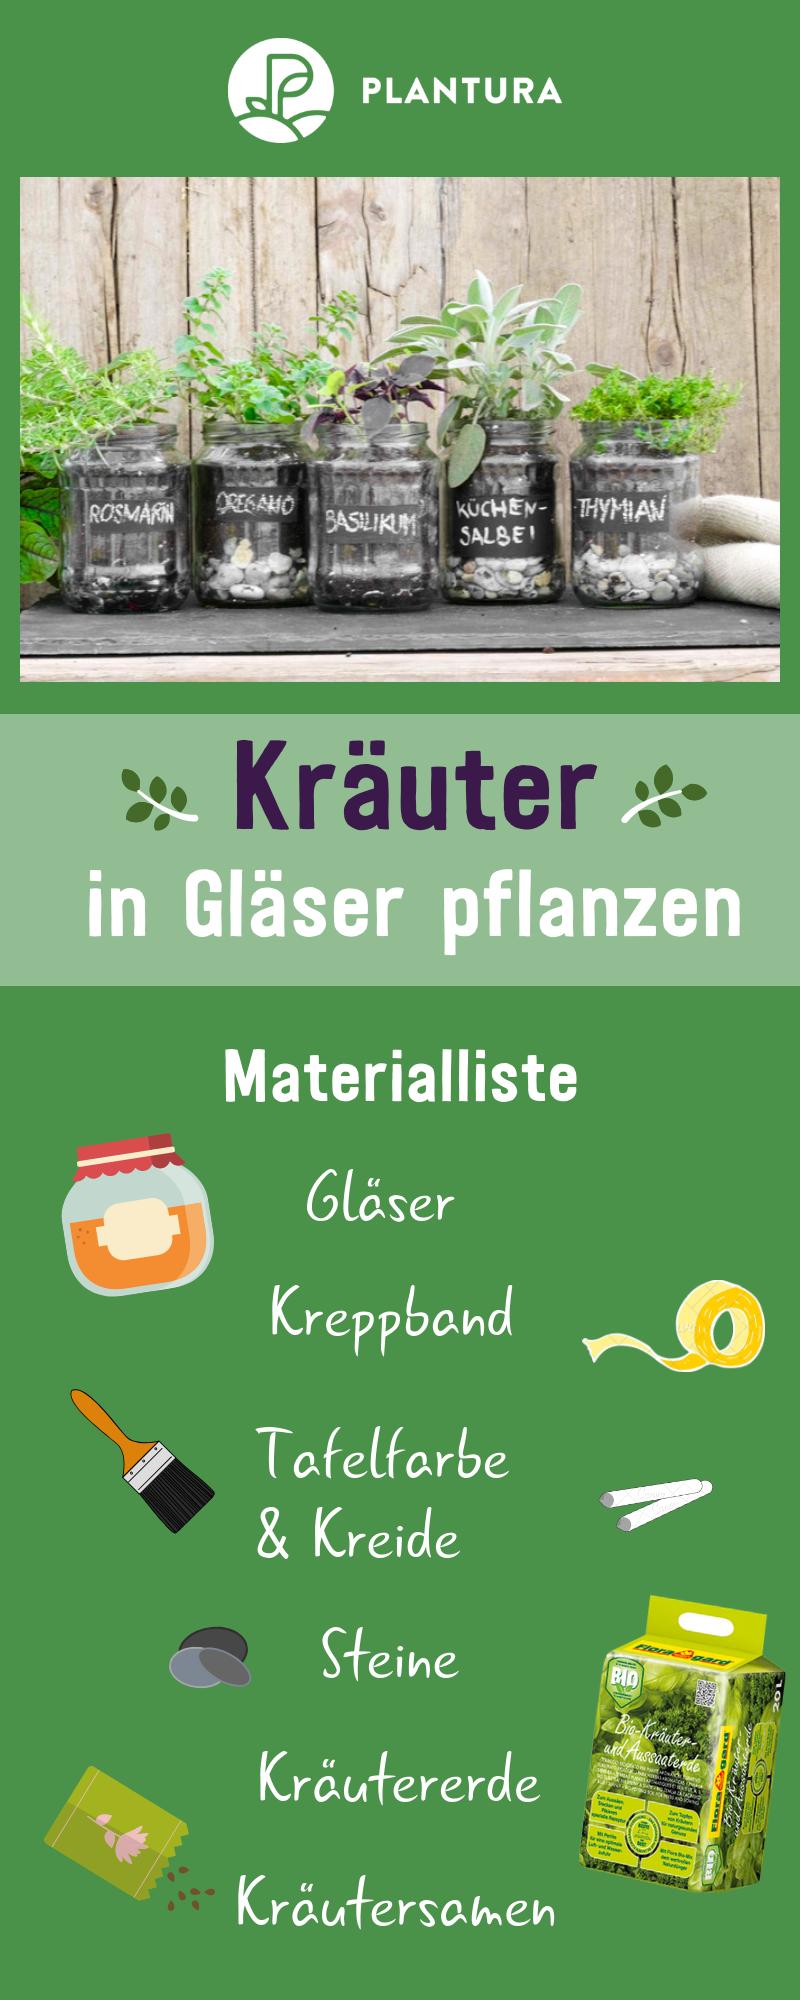 Kräuter im Glas pflanzen: Video-Anleitung & Tipps #kräutergartendesign